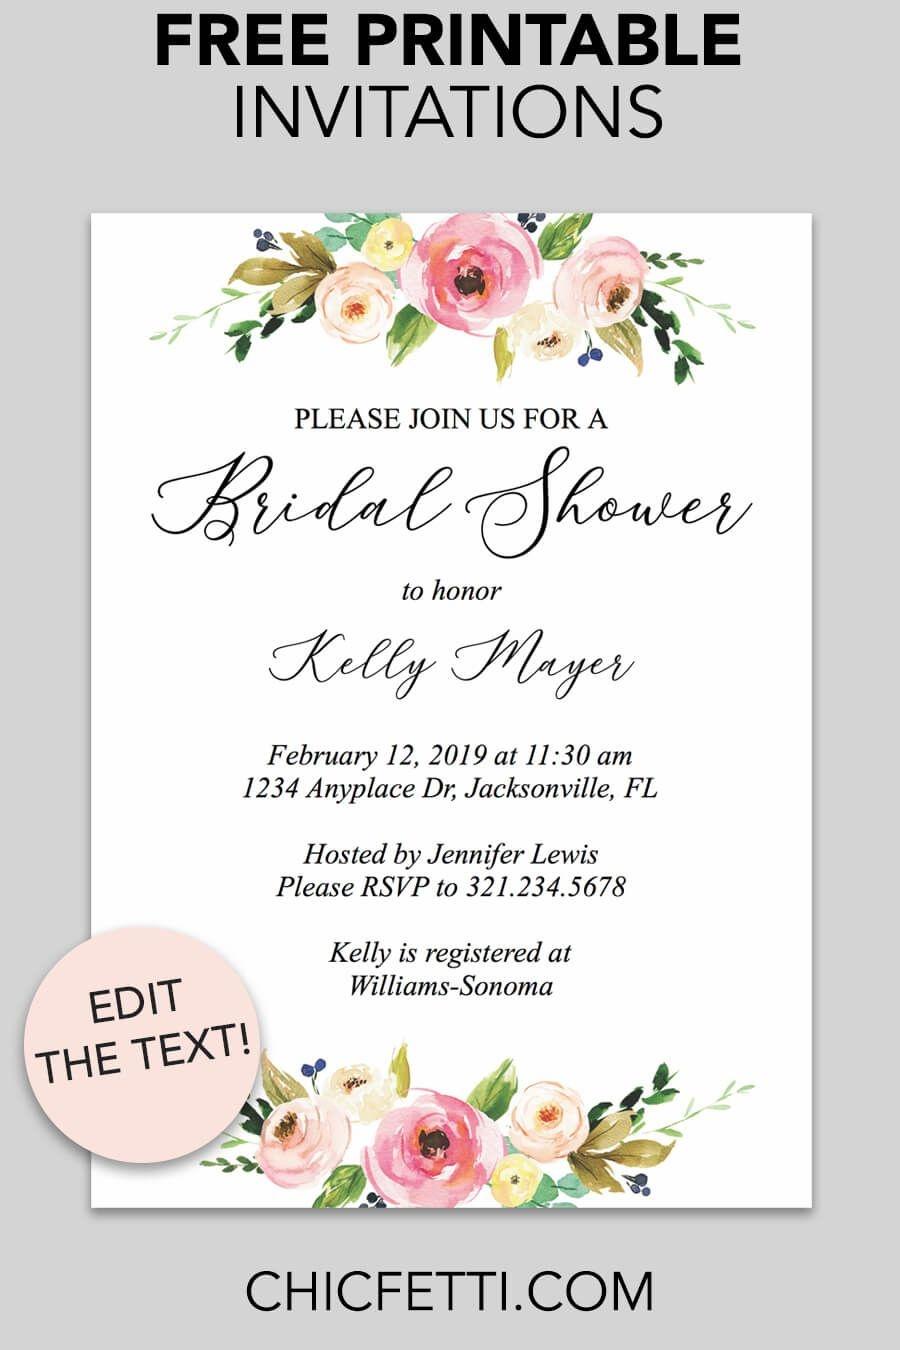 Floral Printable Invitation | Free Printable Invitations | Free - Free Printable Bridal Shower Invitations